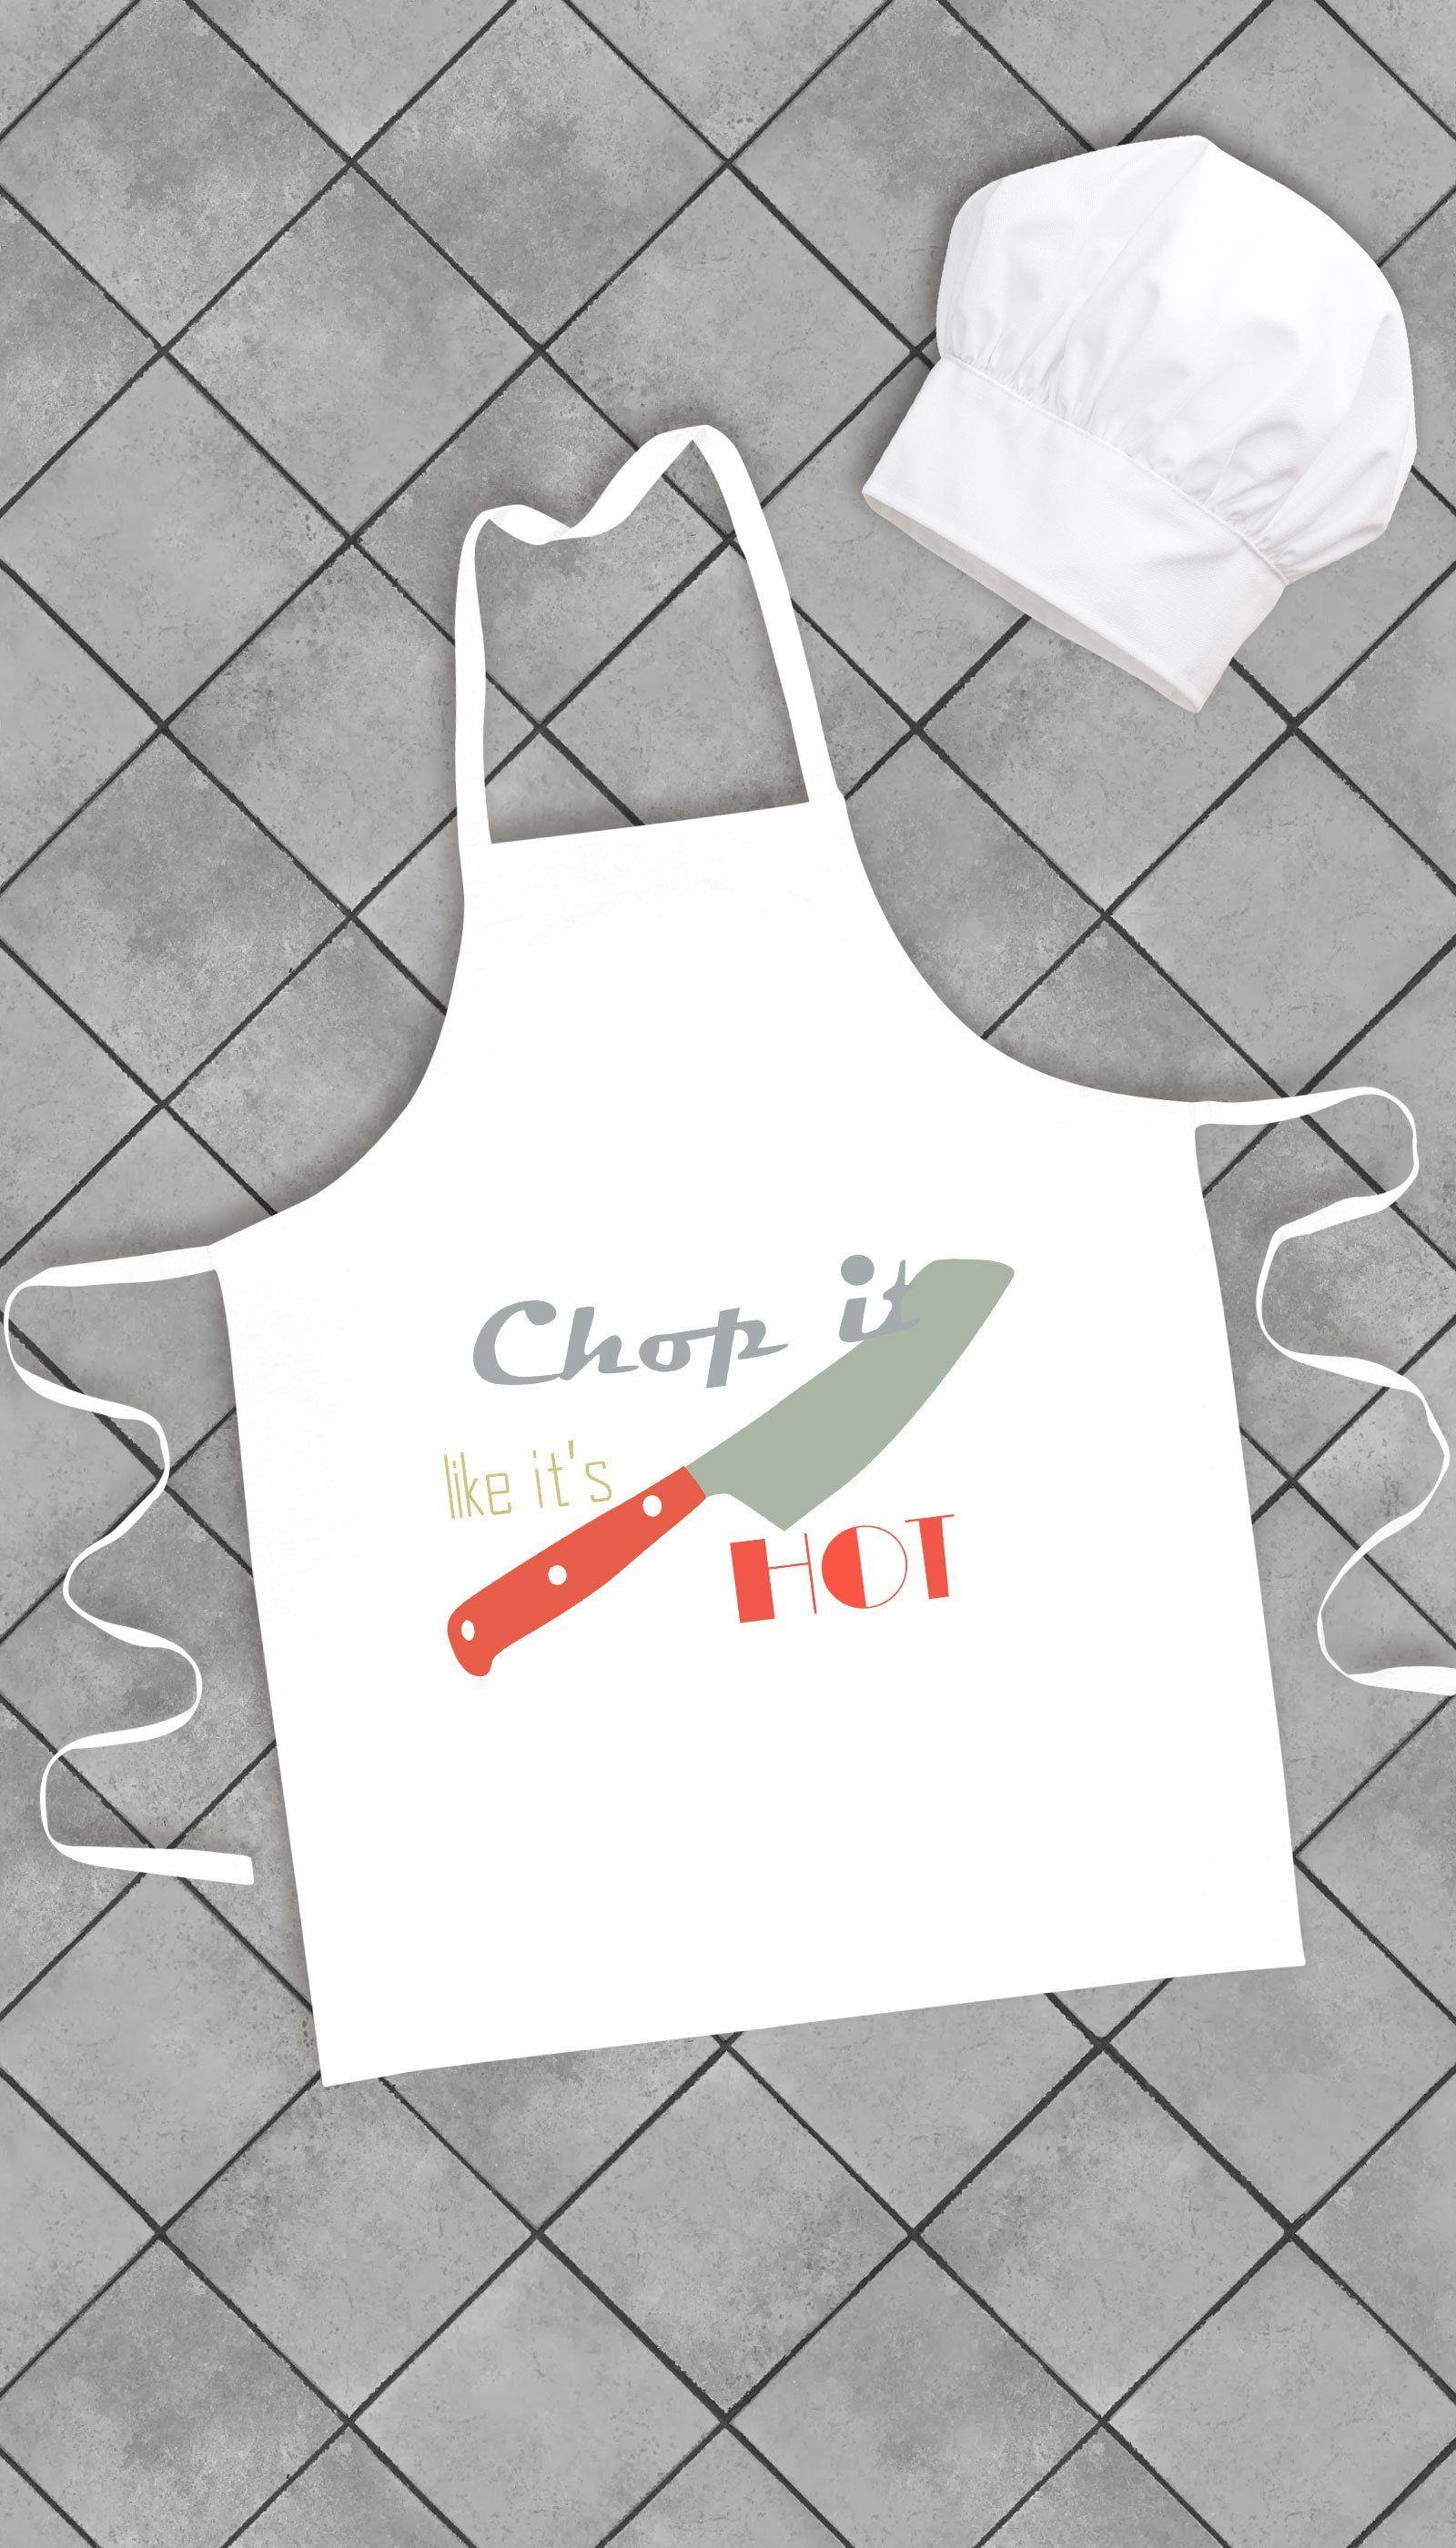 chop it like it's hot funny kitchen apron | kitchen humor